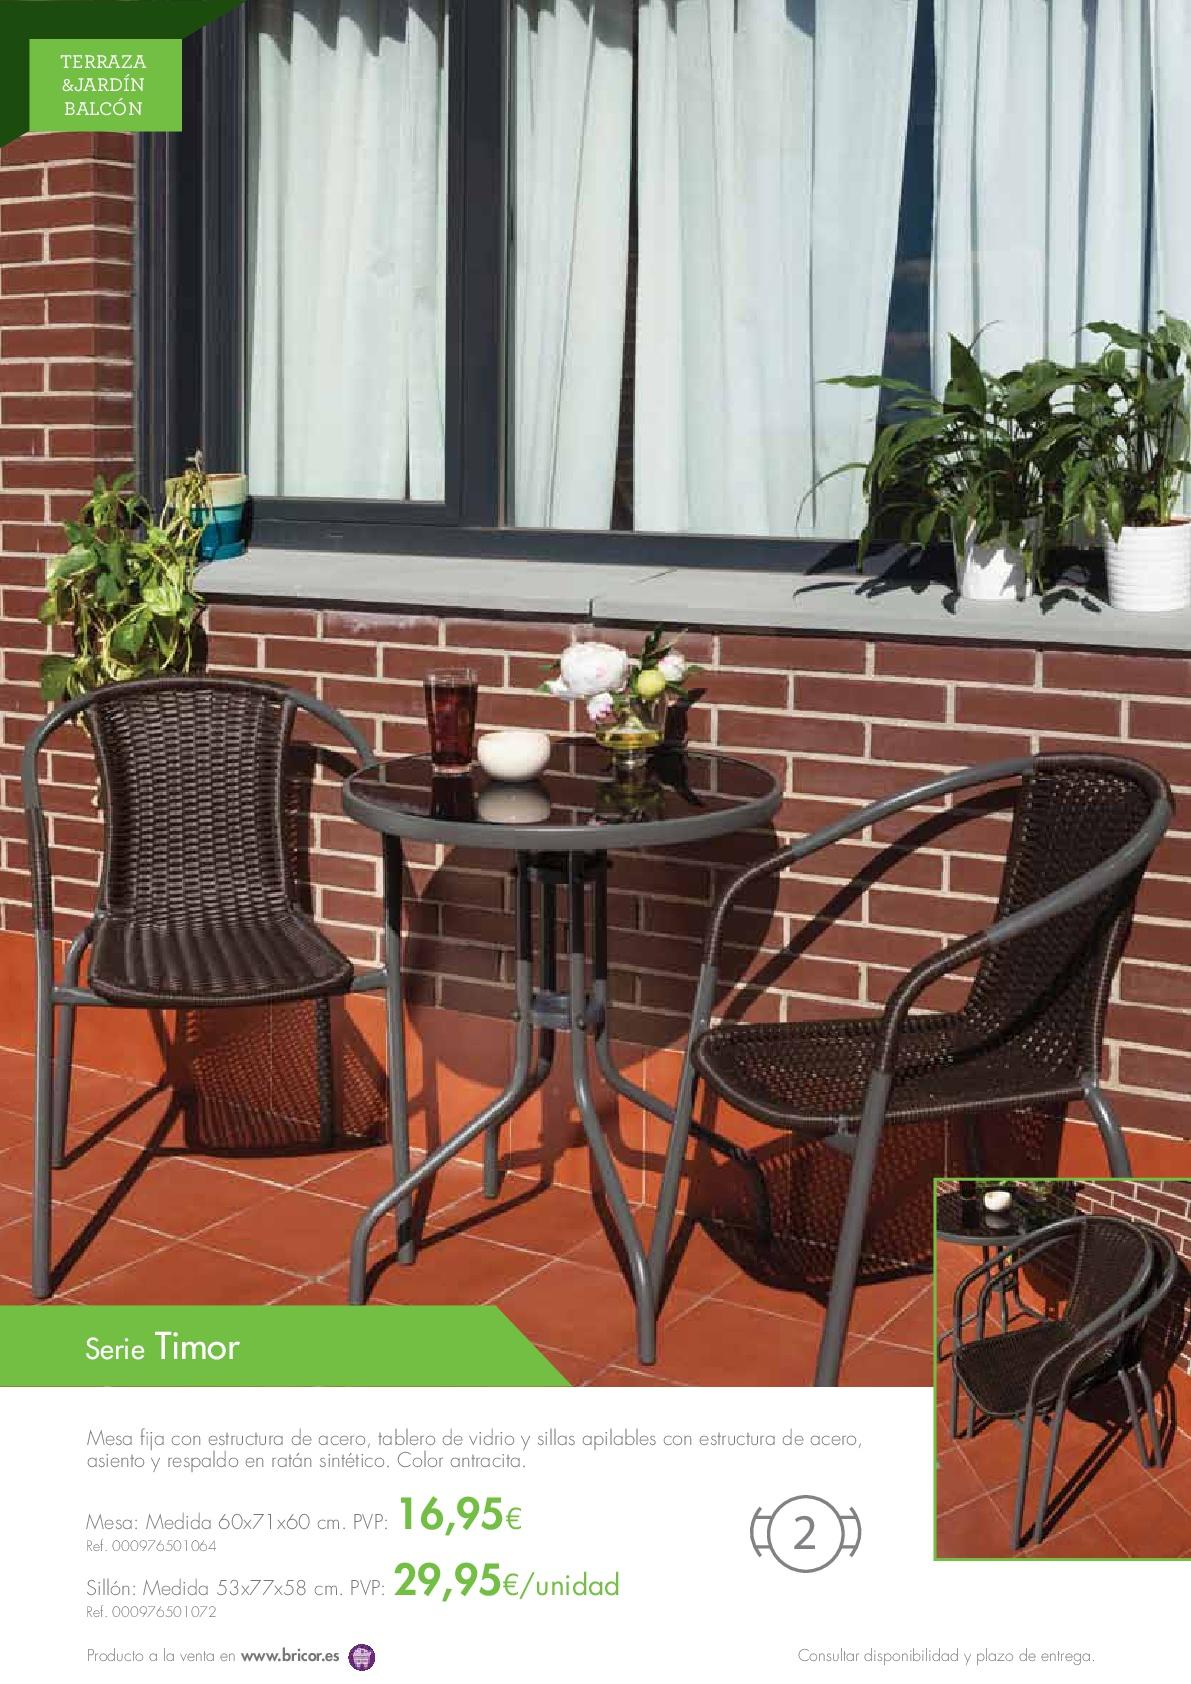 Bricor muebles jardin 20168 for Catalogos muebles jardin baratos